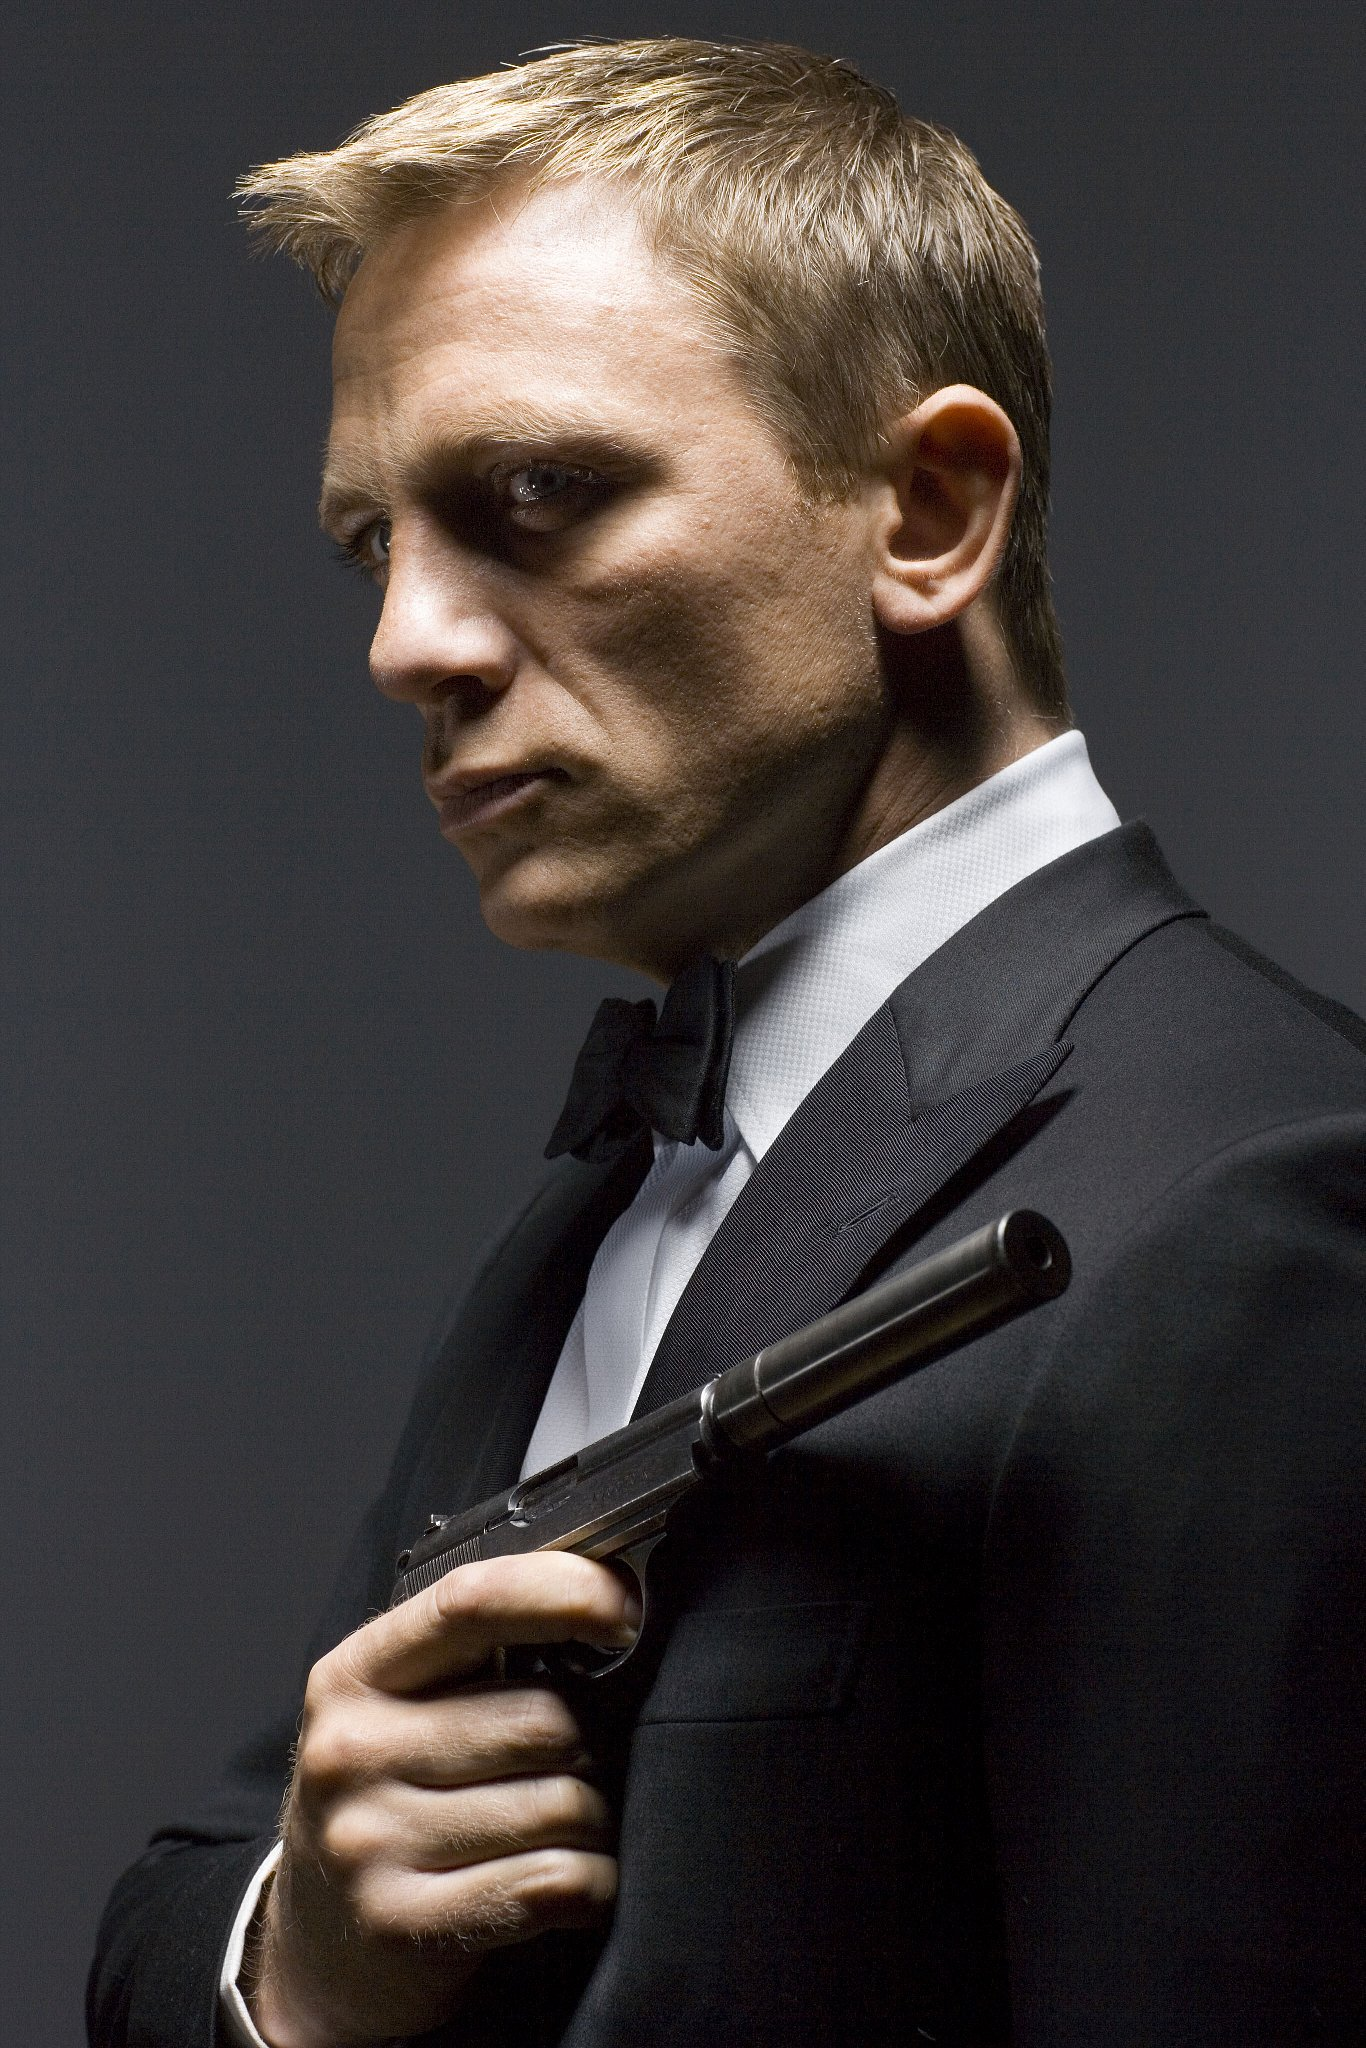 James Bond - Daniel Craig - (2006-2015)